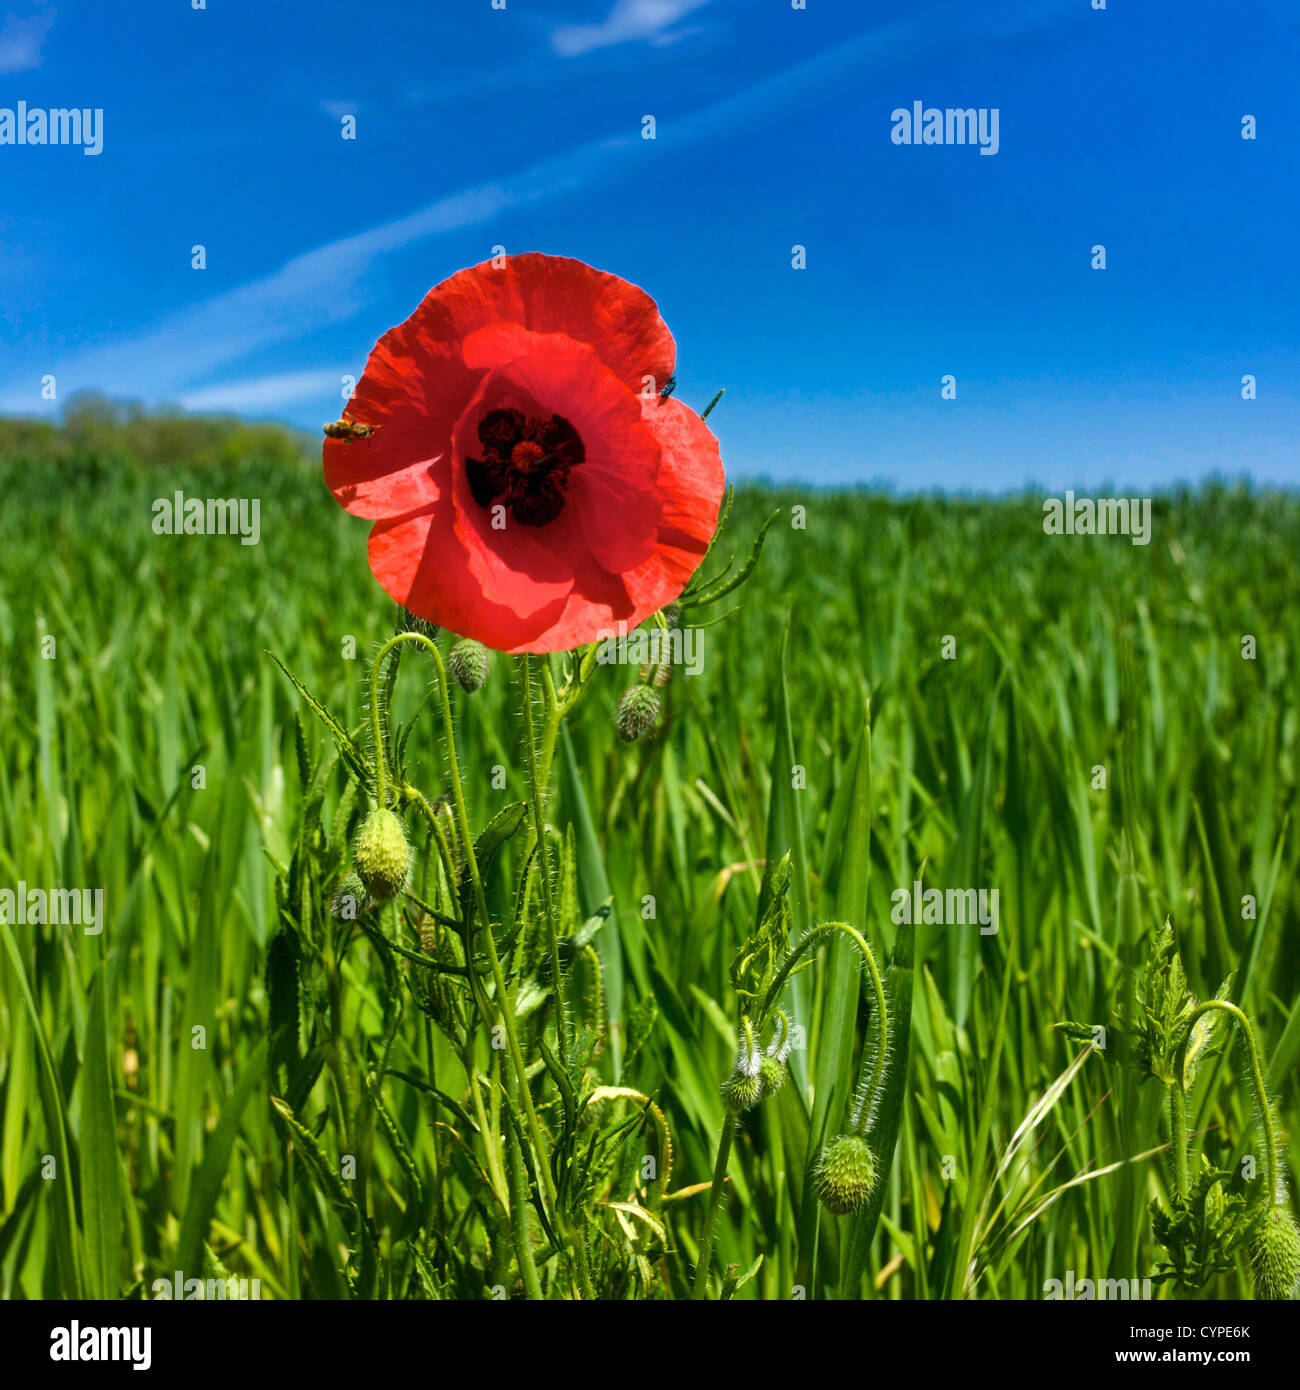 single poppy flower in a field of wheat stock photo royalty free